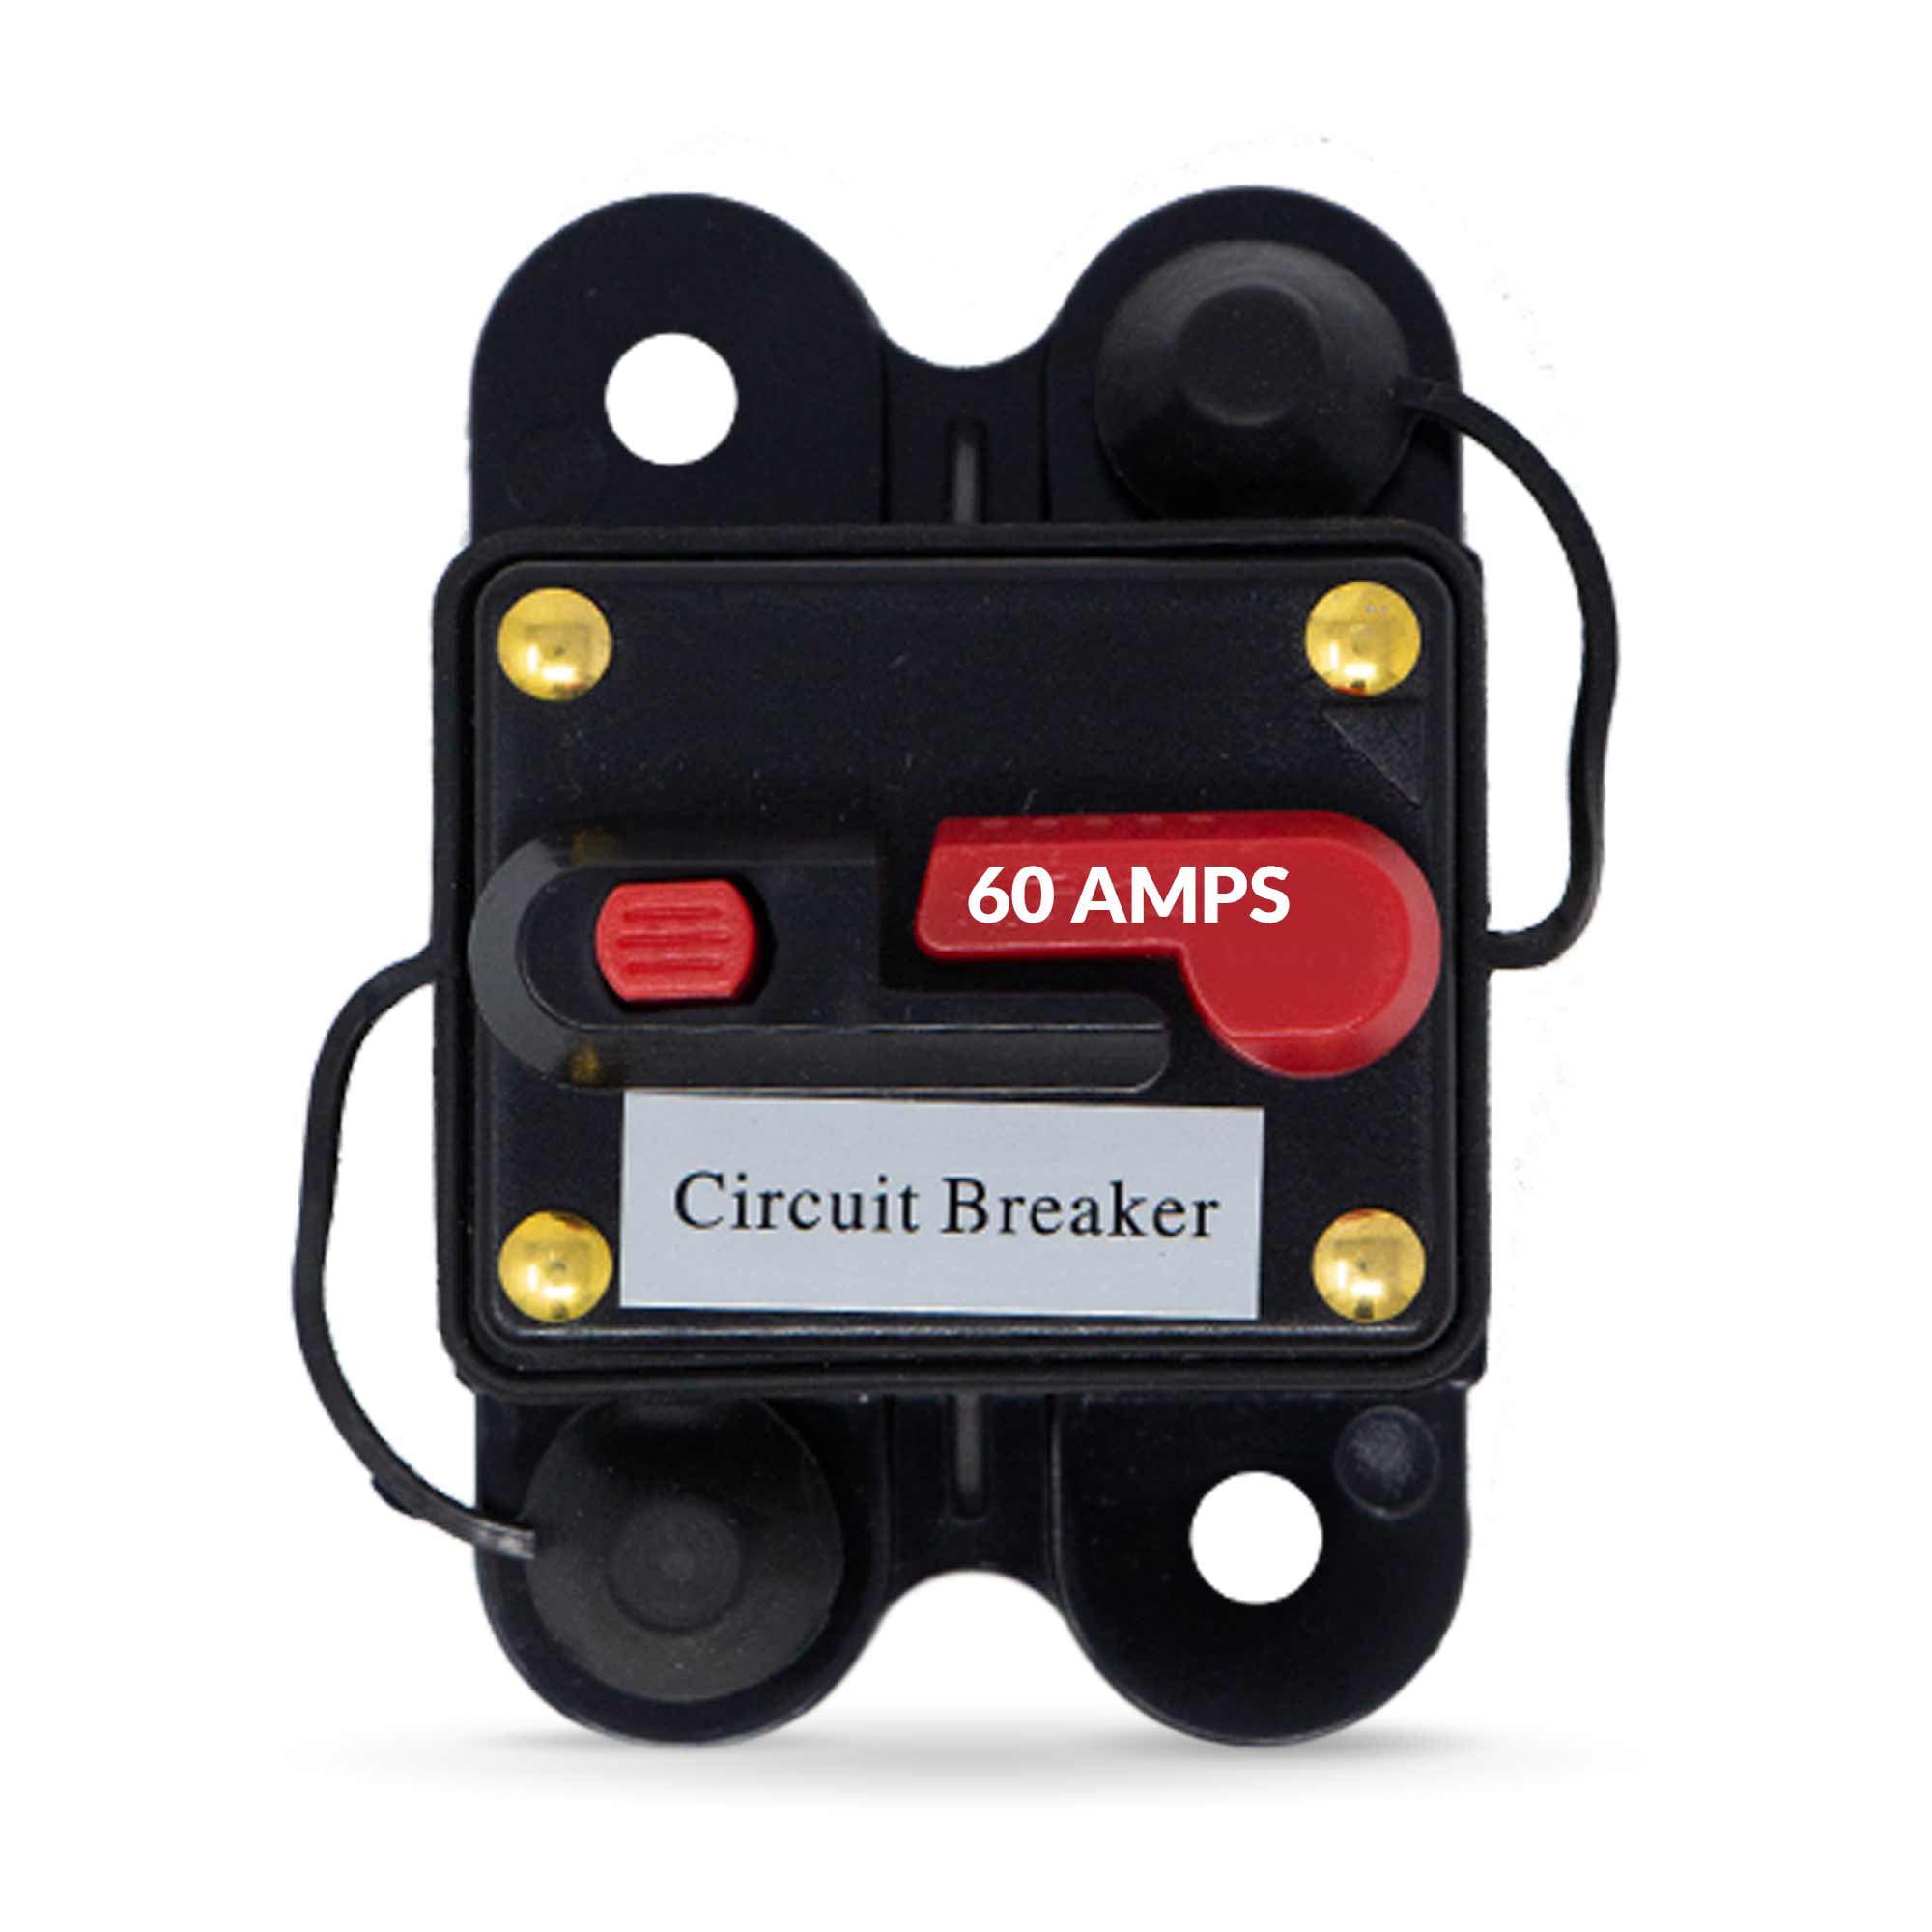 Five Oceans Marine circuit breaker (60amp) for Anchor Windlass FO-3295